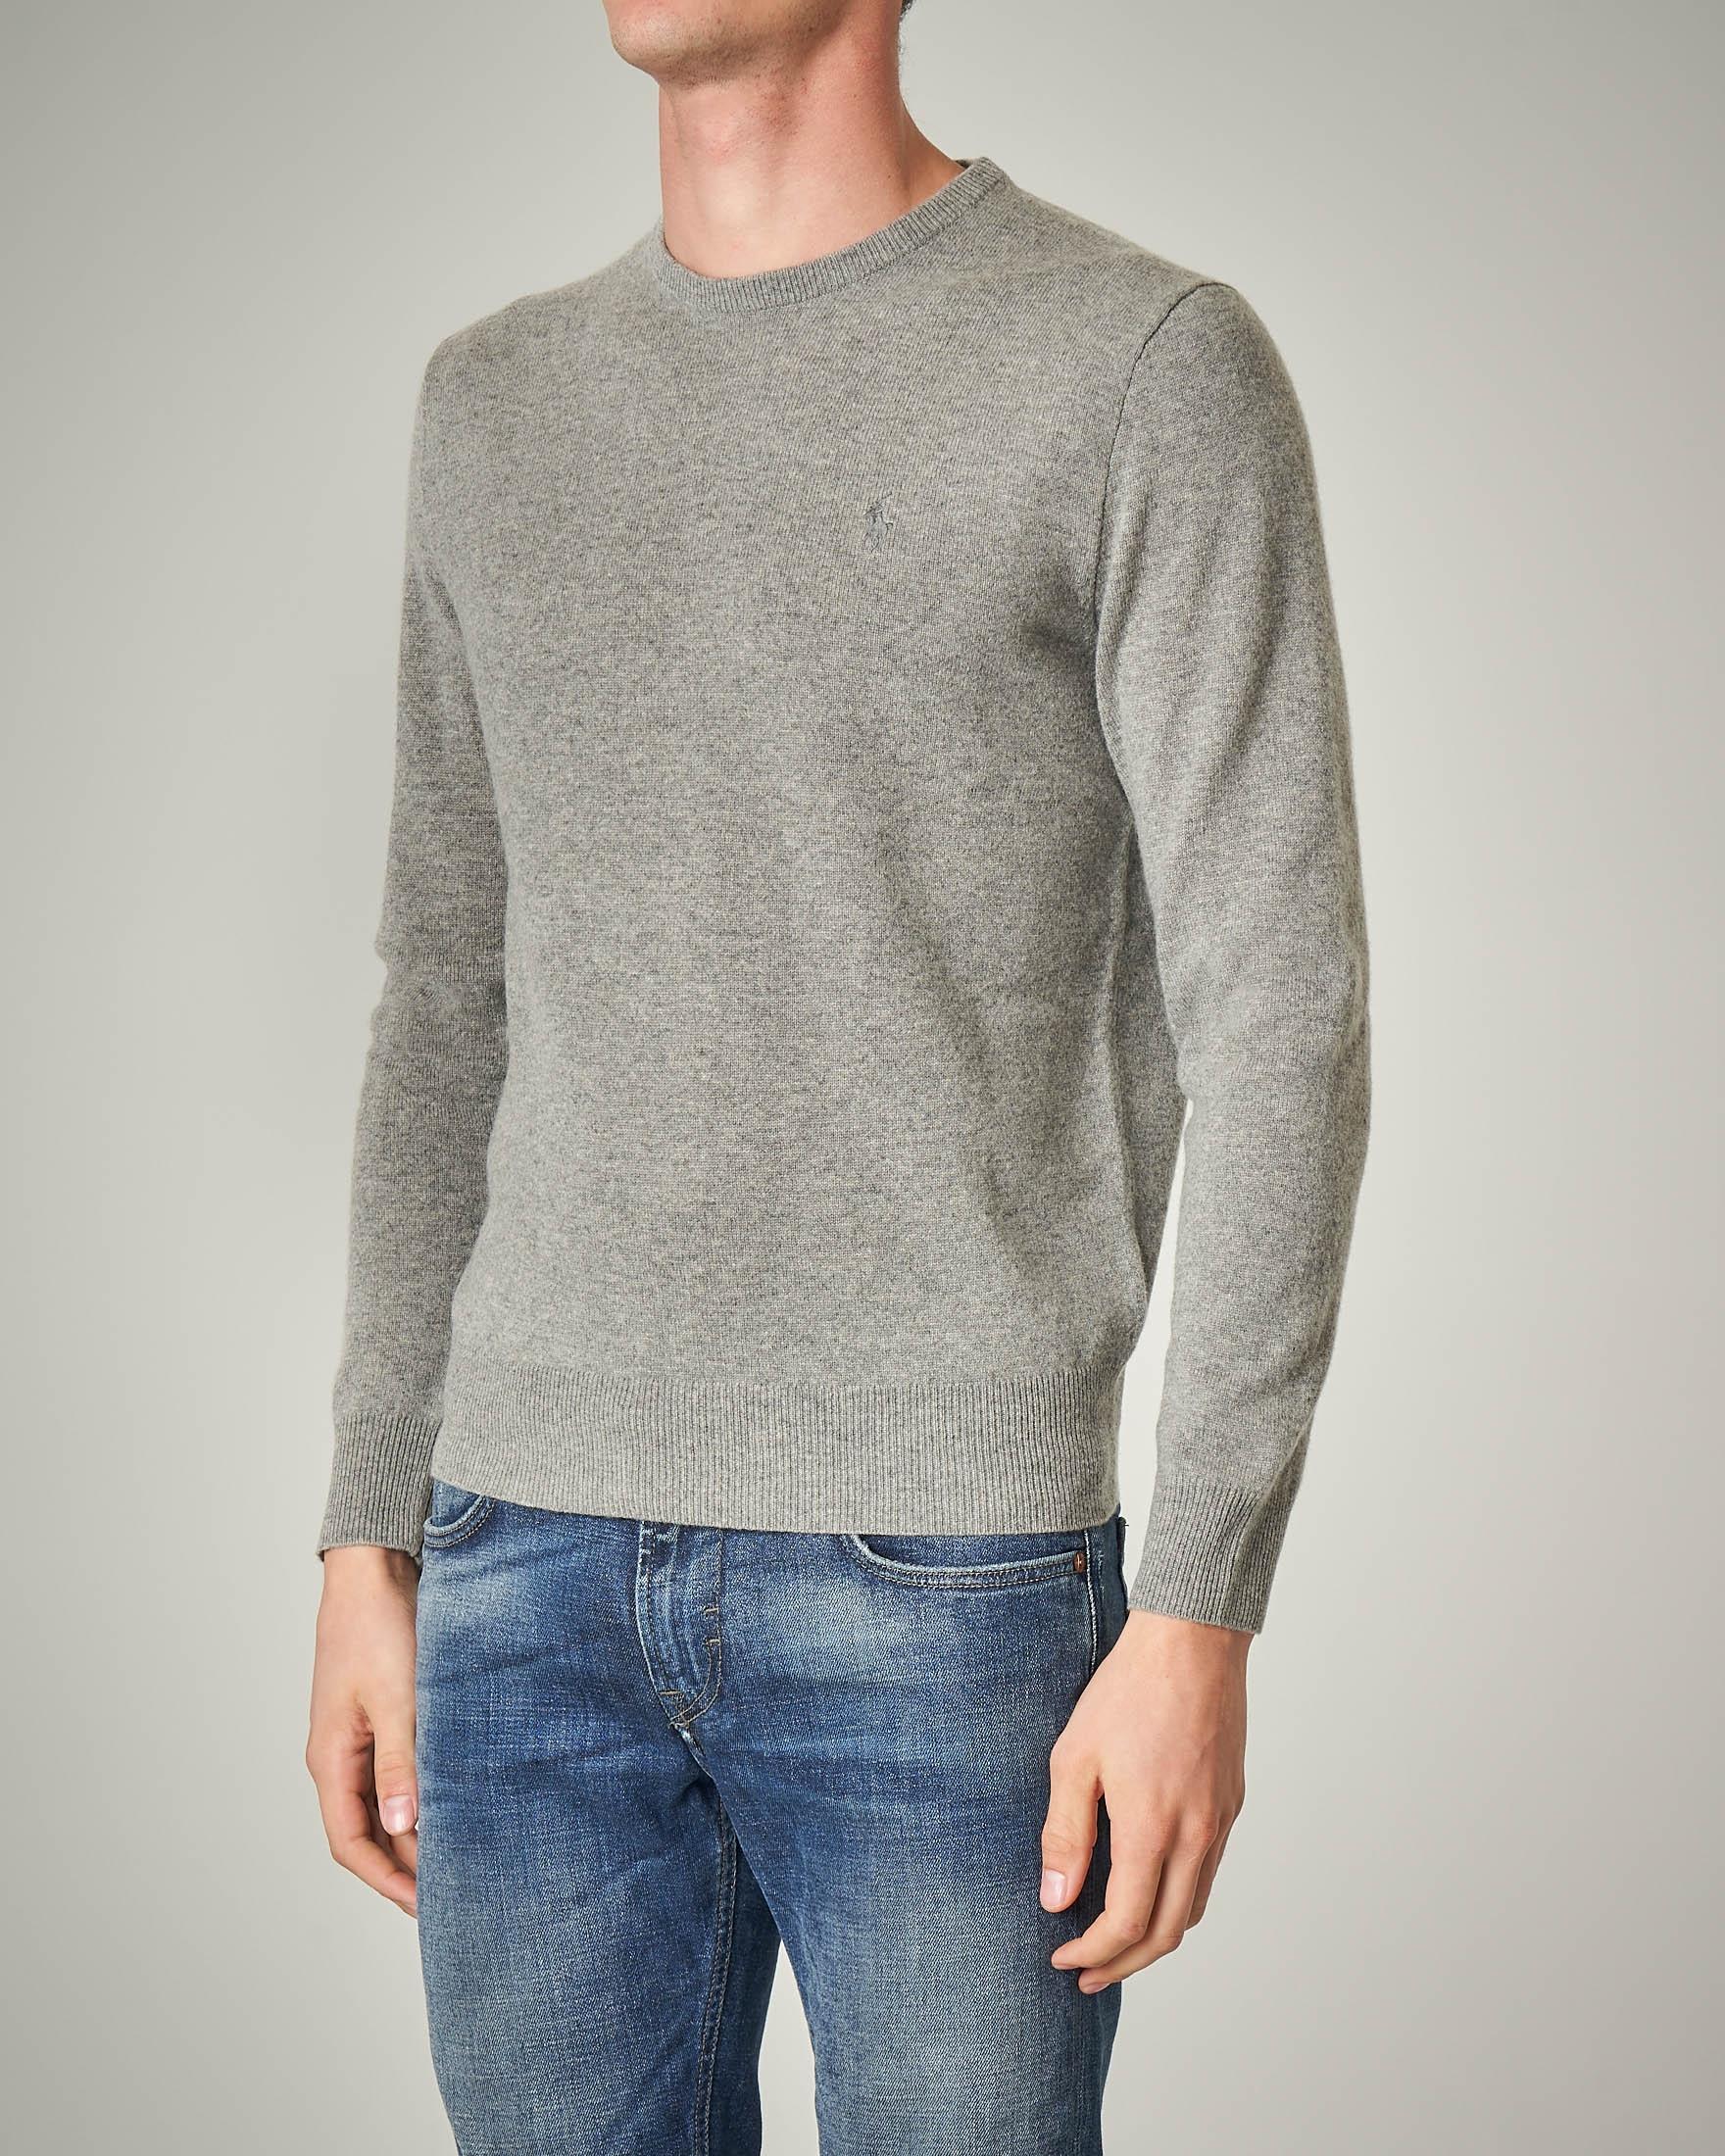 Maglia grigio melange girocollo in lana merino